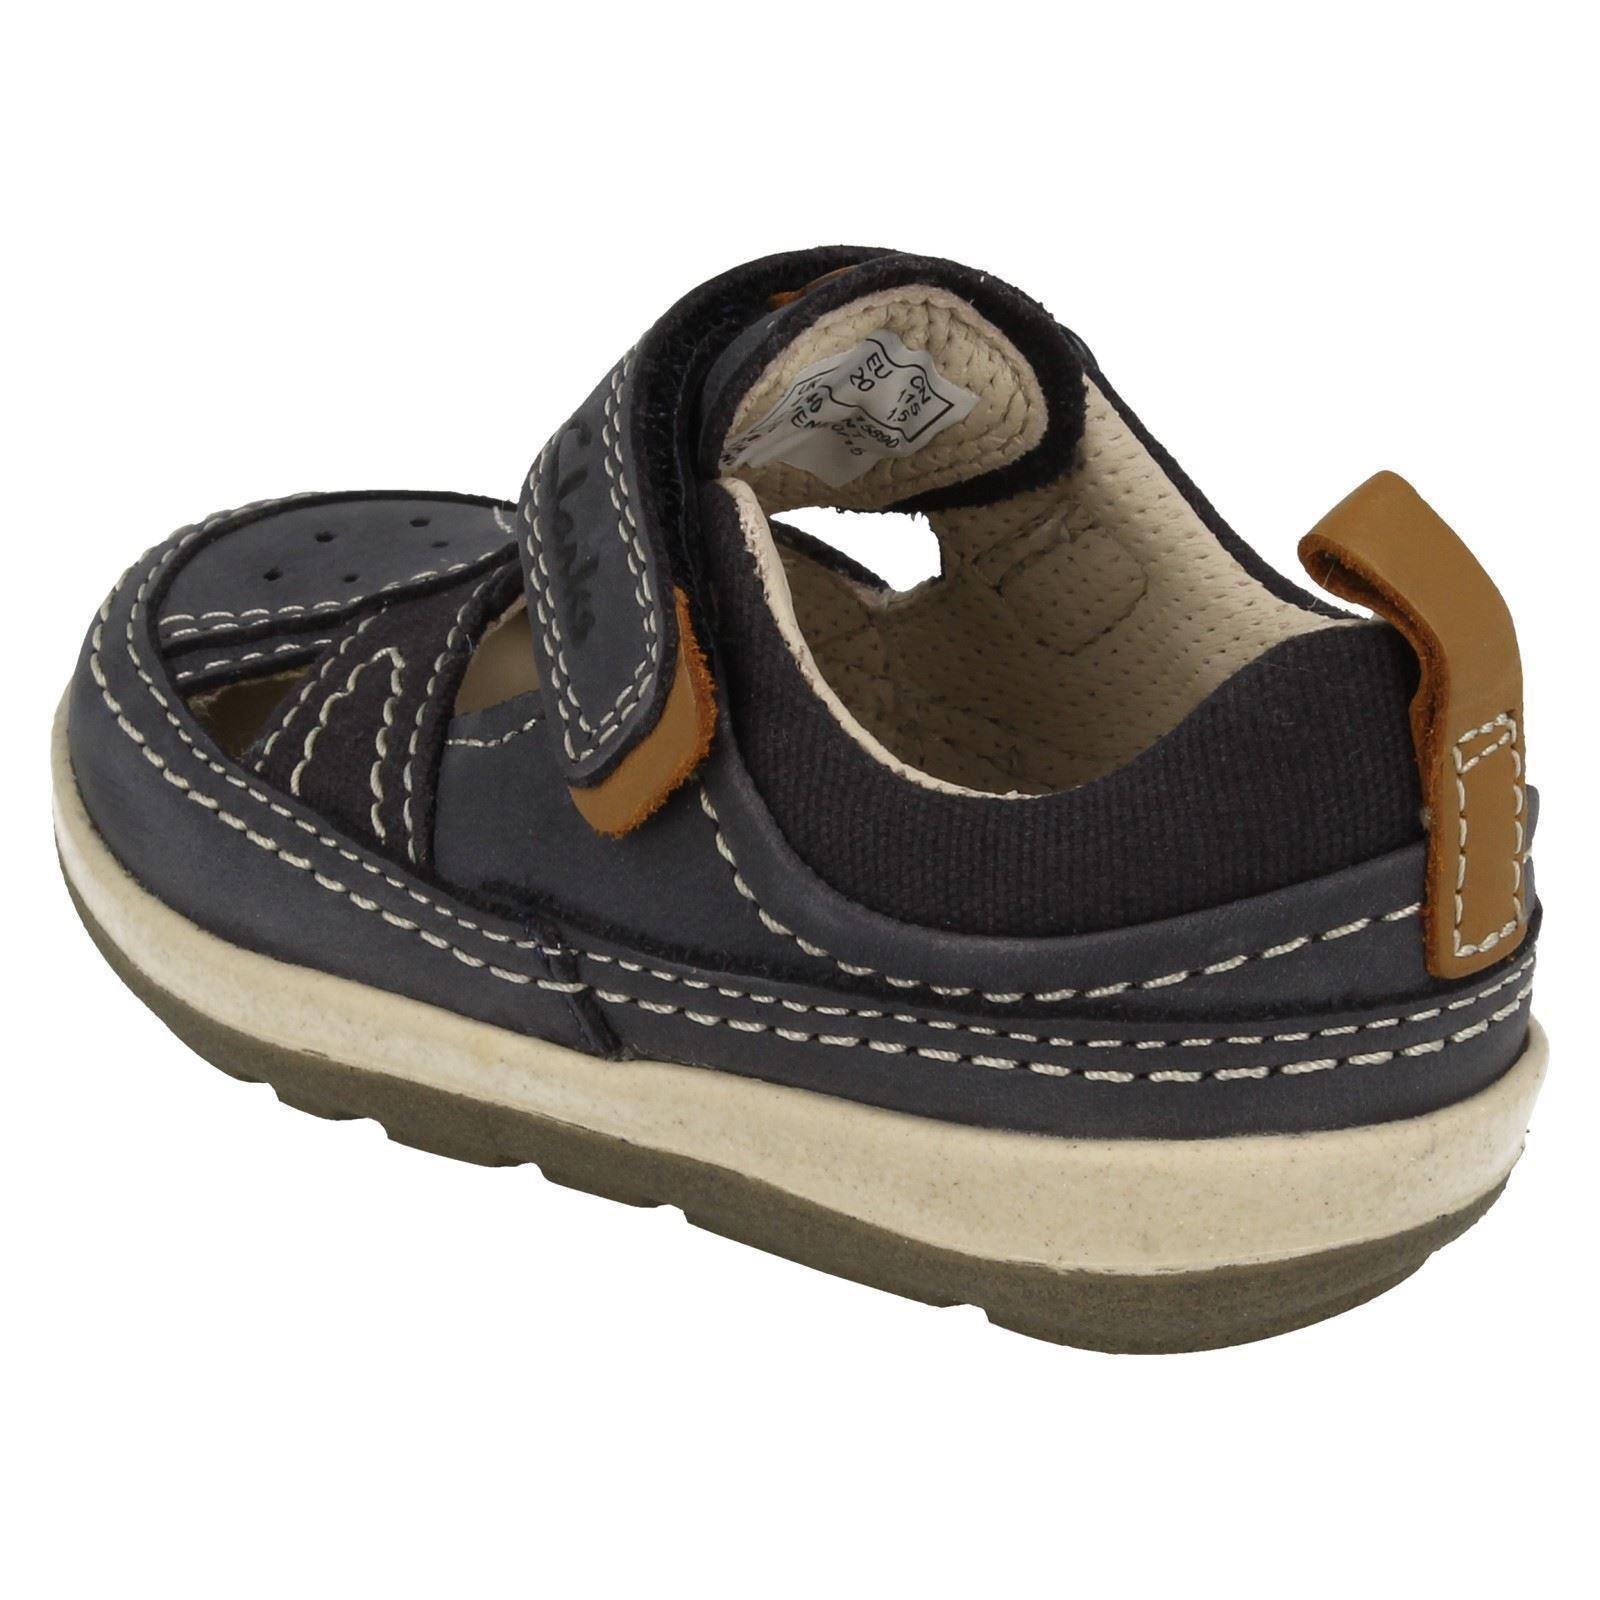 Clarks Boys Closed Toe Sandals Softly Luke